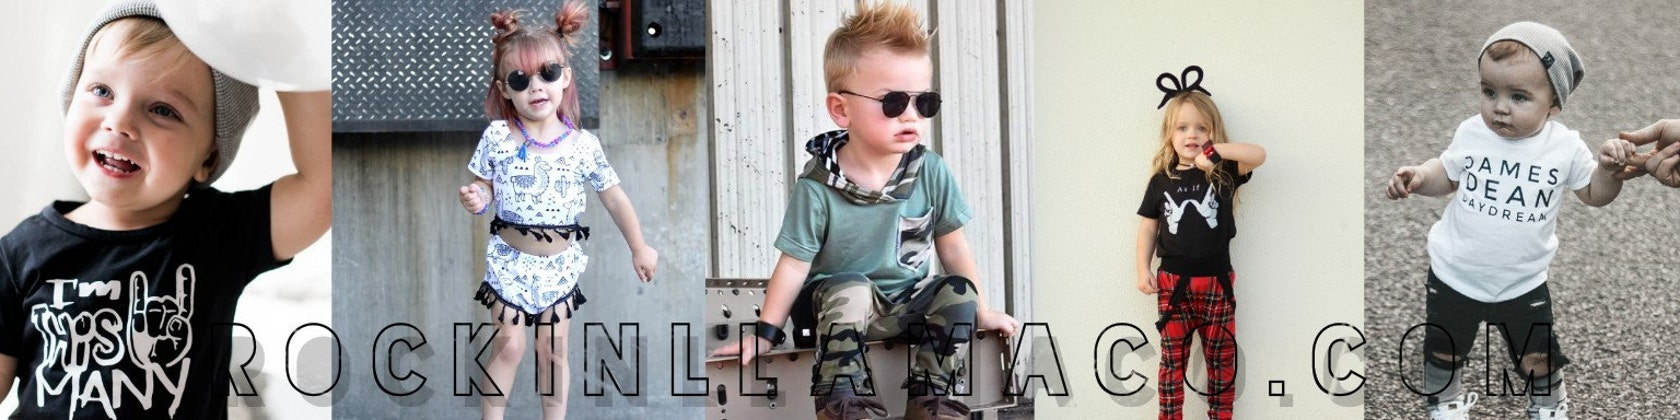 Checker Leg Pocket Harem Pants Baby Toddler Grunge Goth Cool Boy Clothes Rocker Baby Shower Little Rockstar Skater Boy